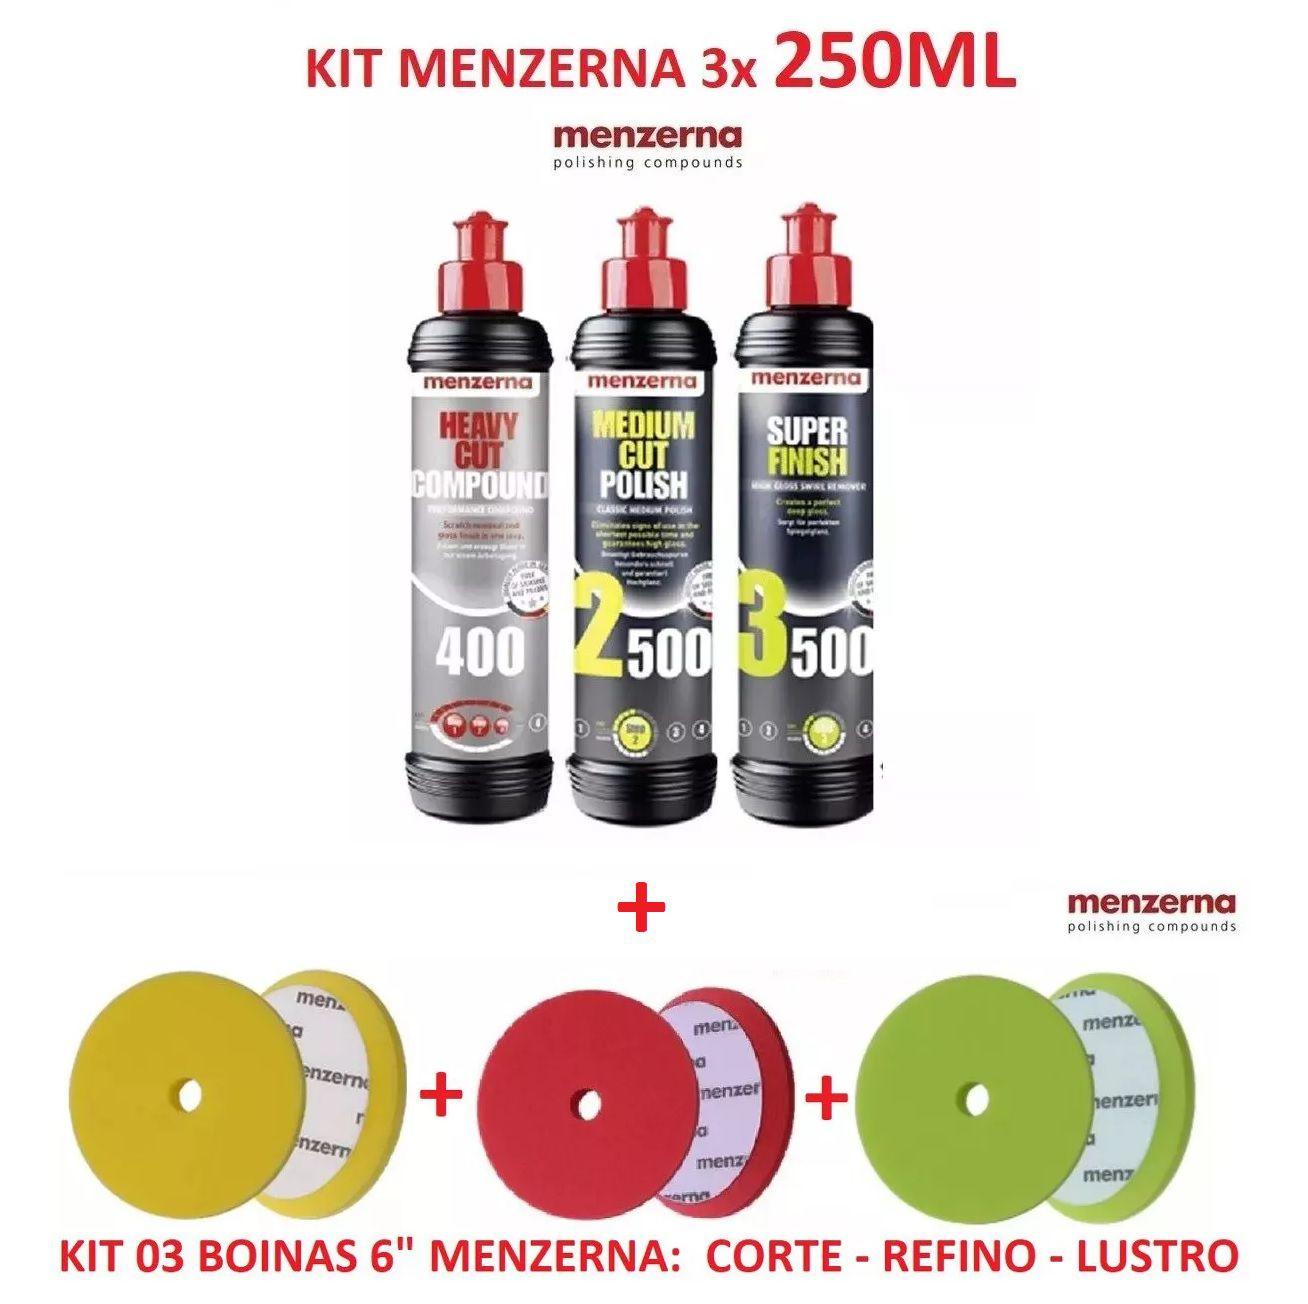 Kit Menzerna C/ Pf2500 Sf3500 Fg400 S Finish Compound 250ml + 03 boinas corte, refino, lustro